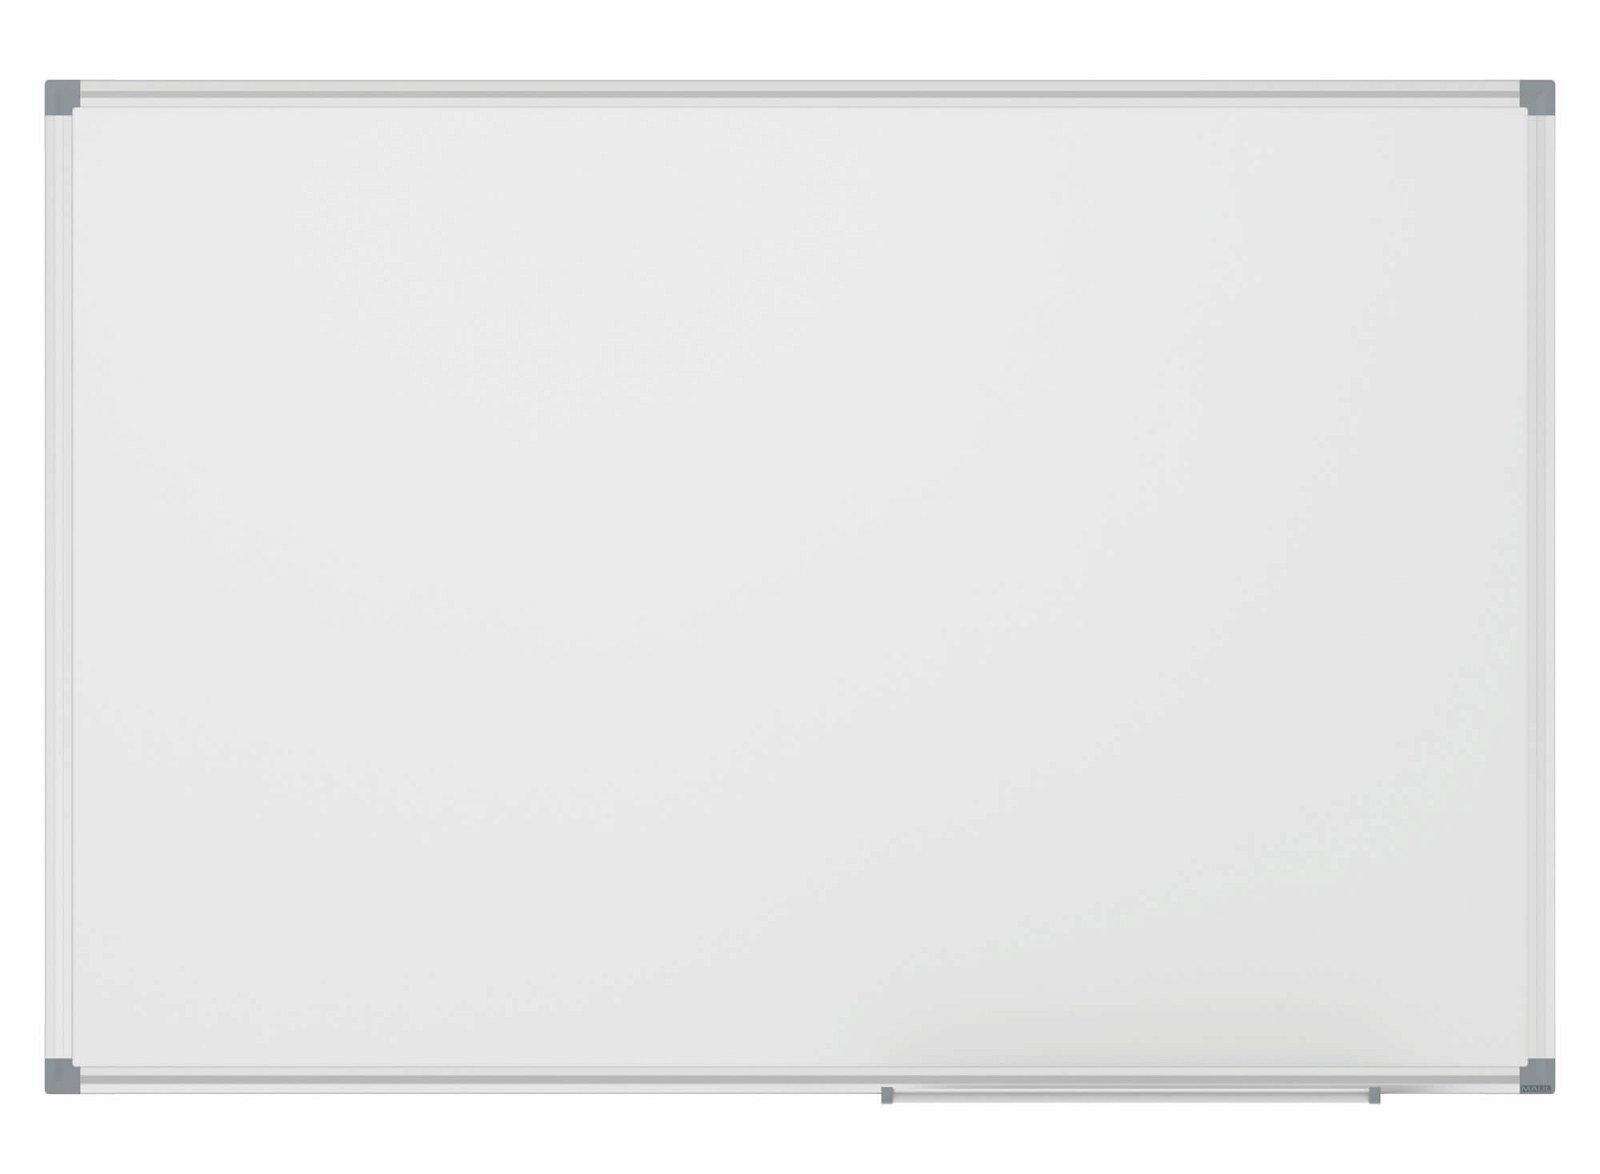 Whiteboard MAULstandard, Emaille, 60x90 cm, grau